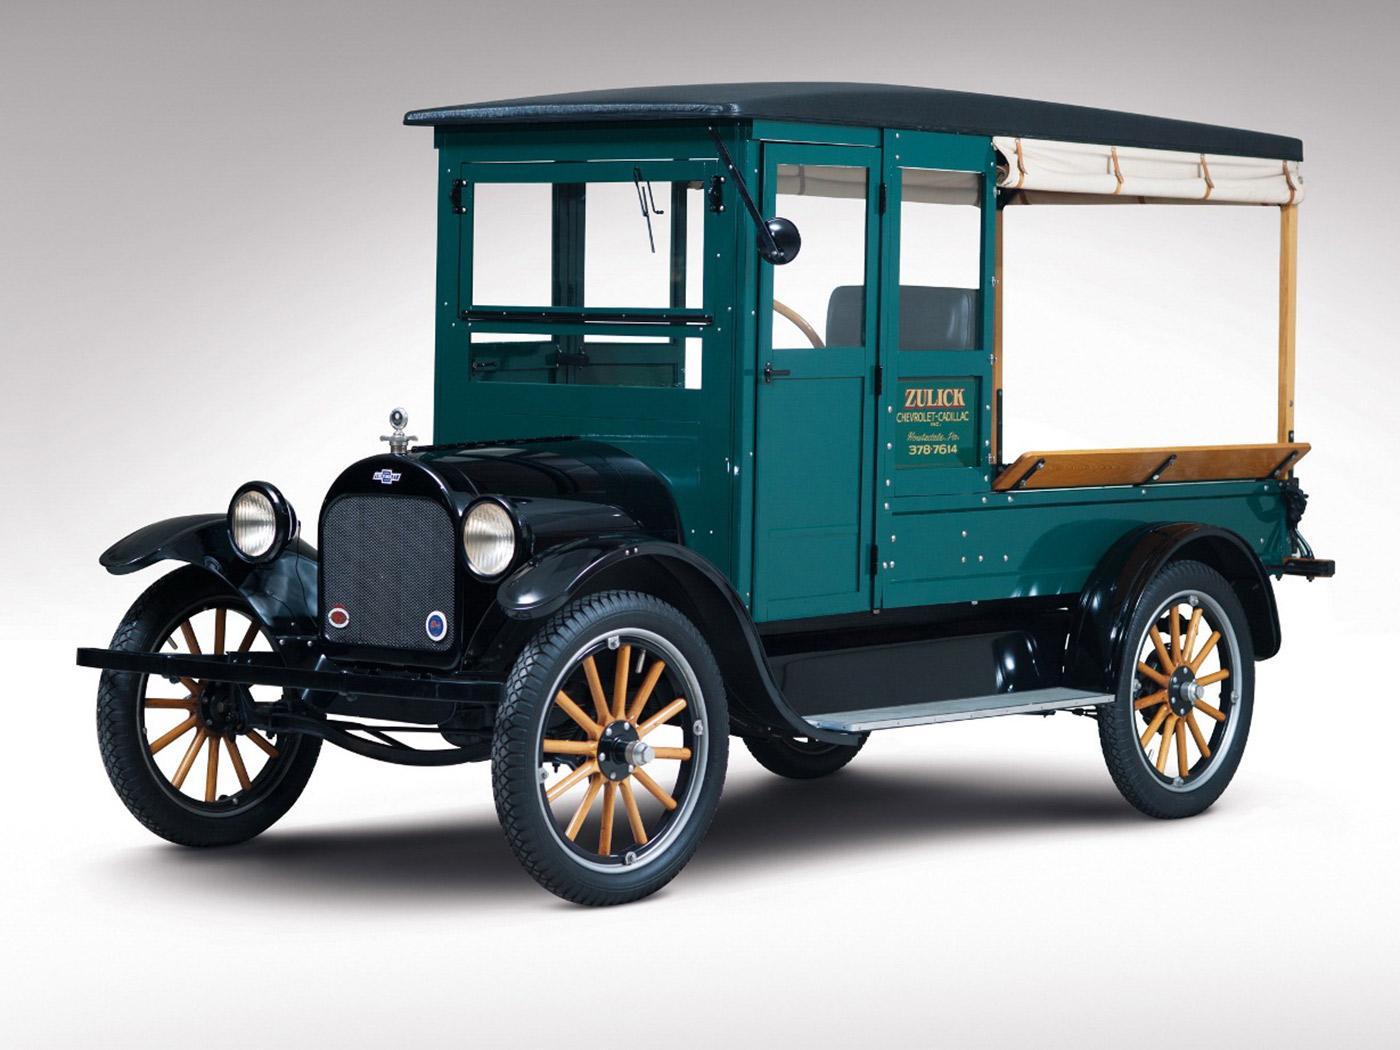 1922-chevrolet-canopy-truck.jpg